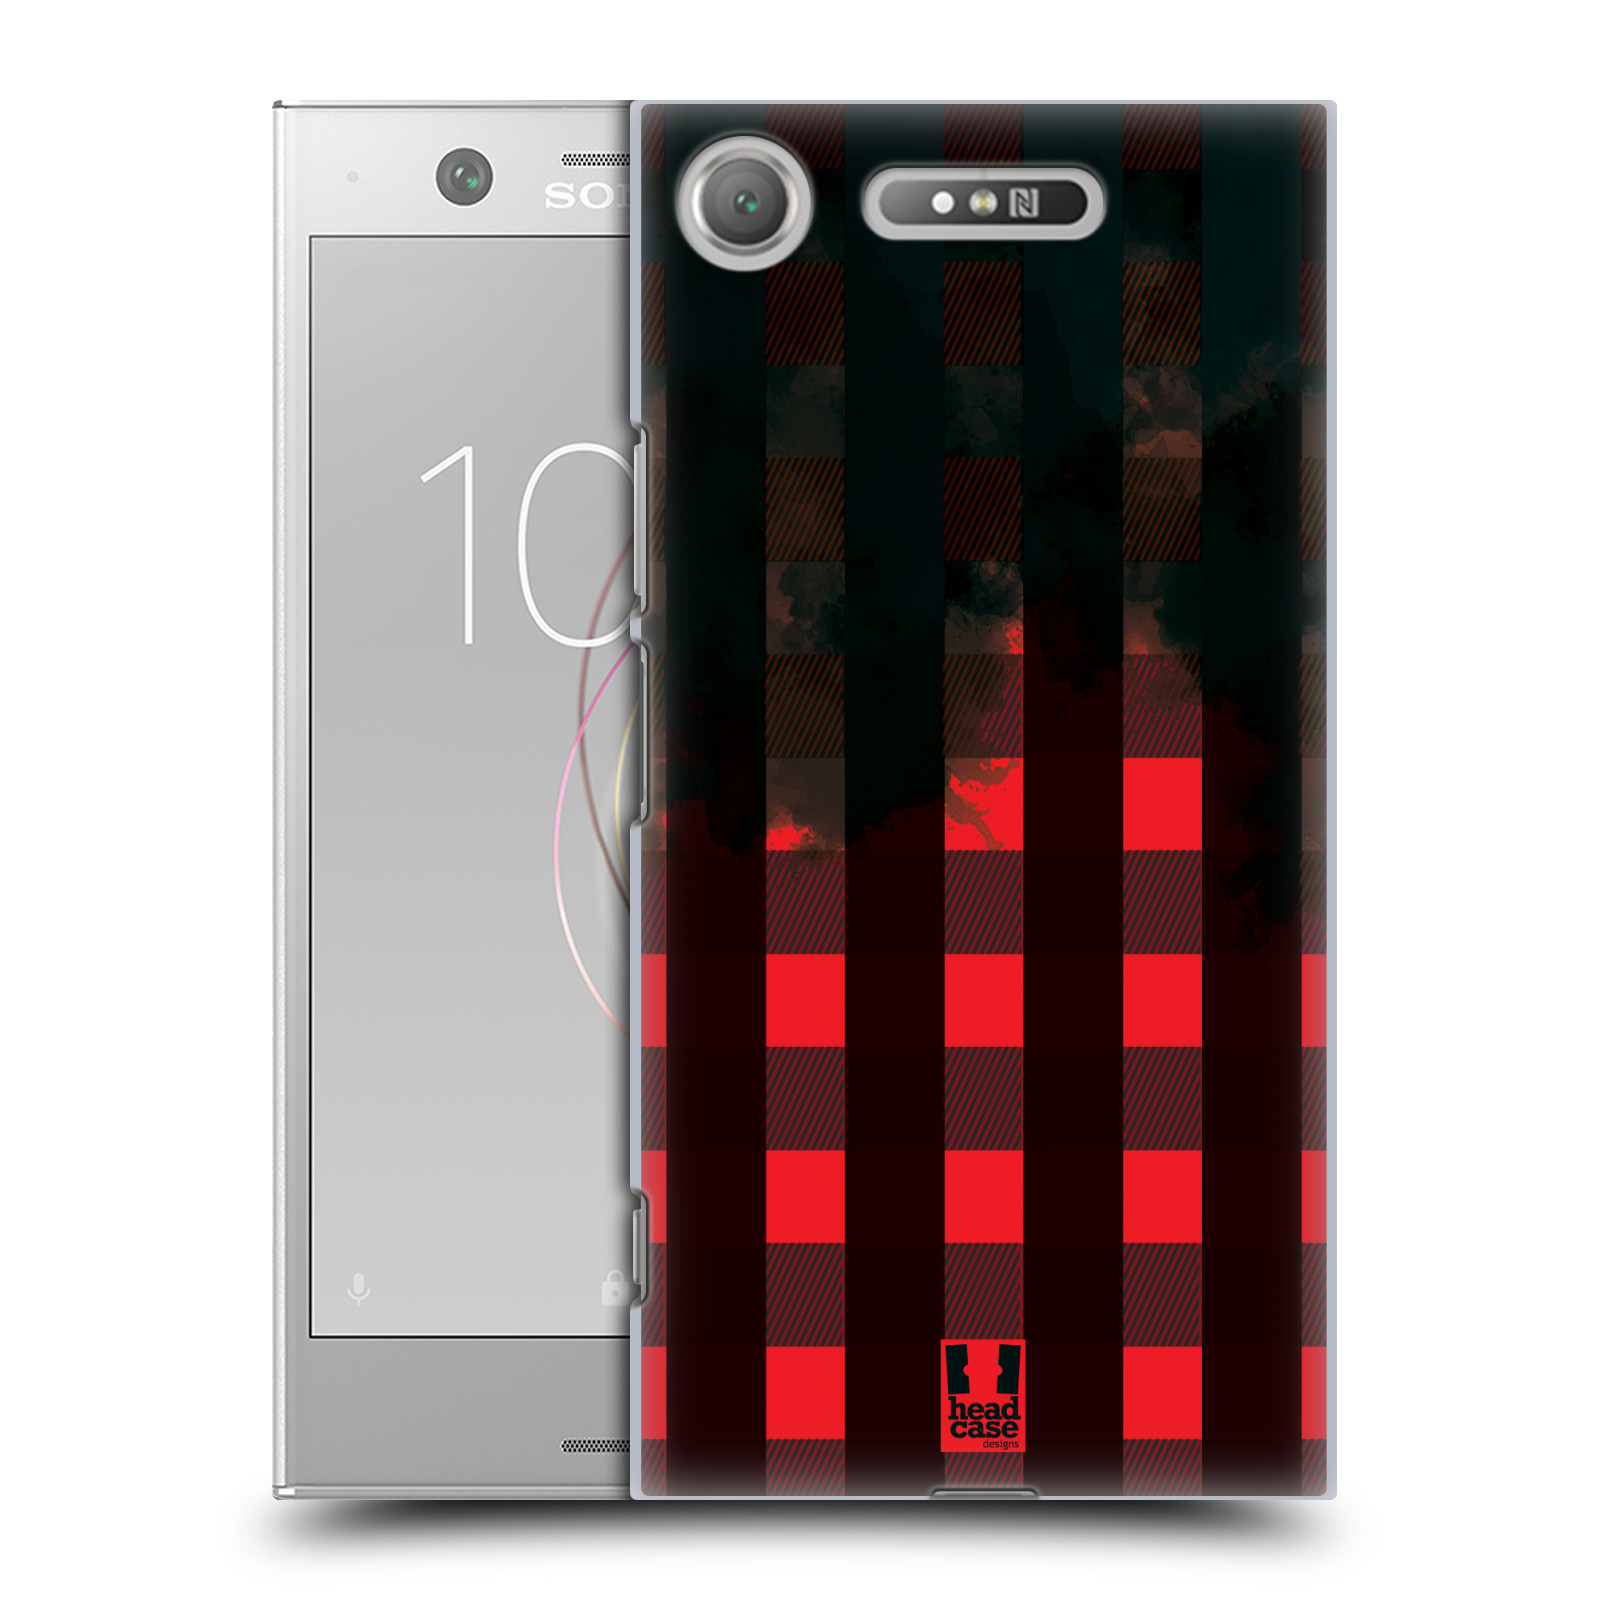 Plastové pouzdro na mobil Sony Xperia XZ1 - Head Case - FLANEL RED BLACK (Plastový kryt či obal na mobilní telefon Sony Xperia XZ1 (G8342 Dual Sim / G8341 Single Sim) s motivem FLANEL RED BLACK)